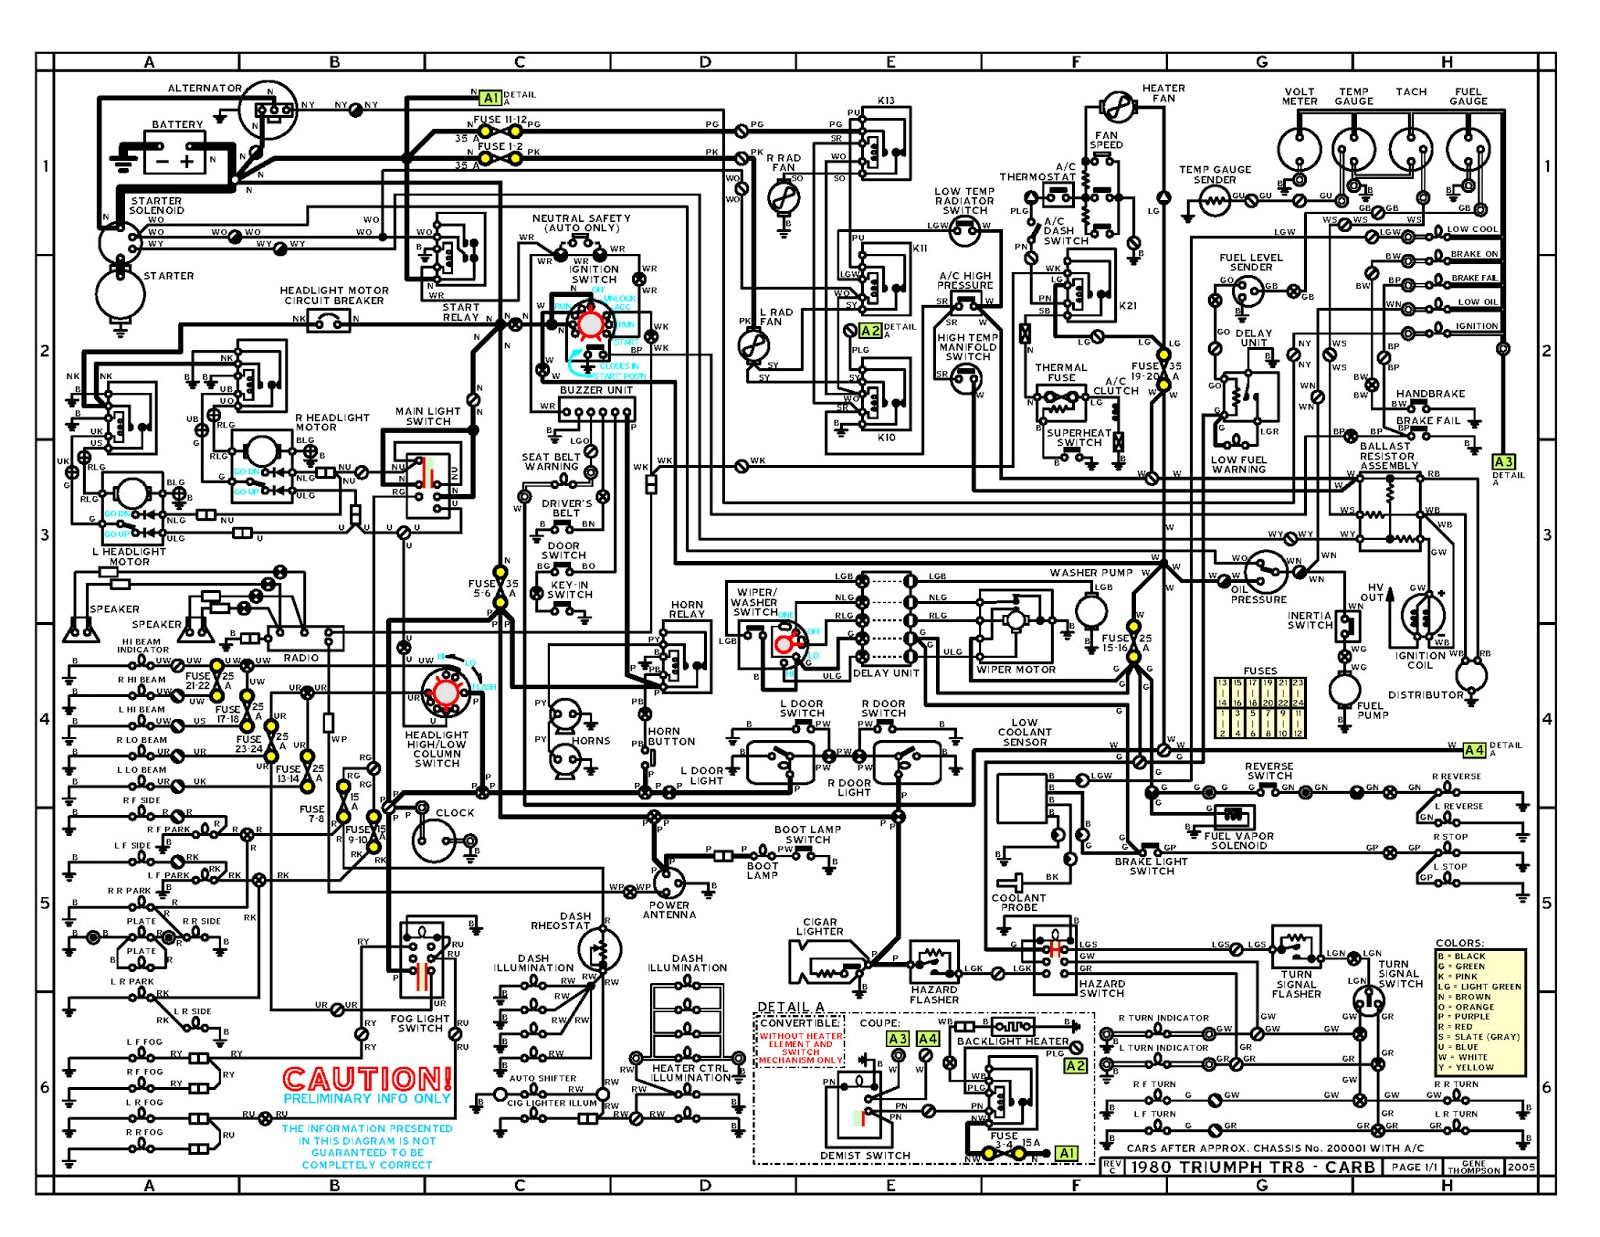 triumph controller diagram, triumph 650 wiring harness, triumph parts diagram, triumph chopper wiring for, triumph frame diagram, triumph clutch diagram, battery diagram, on 1969 triumph wiring diagram